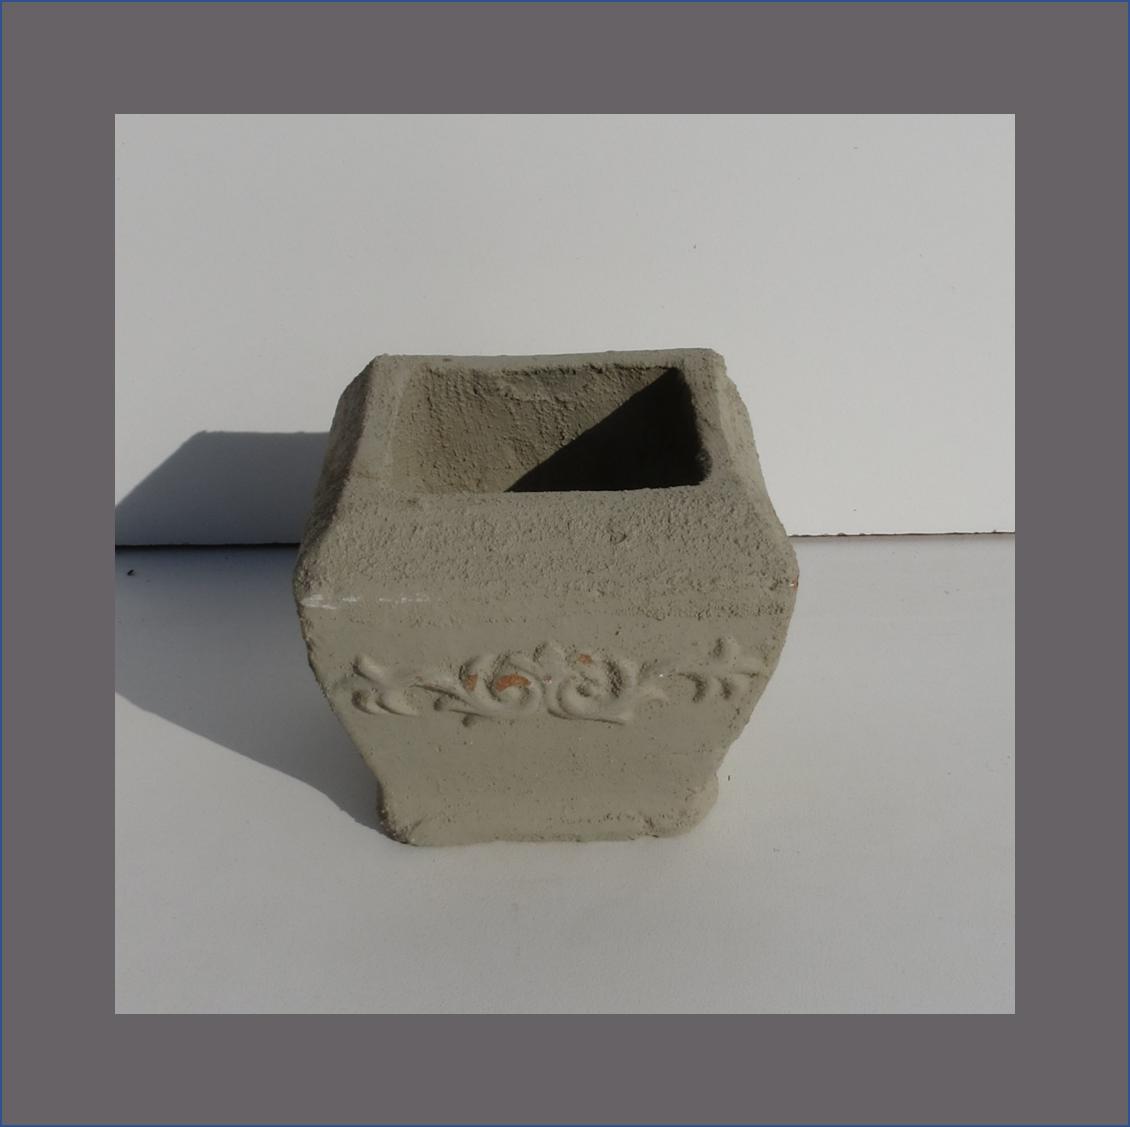 concrete-flower-motive-vase